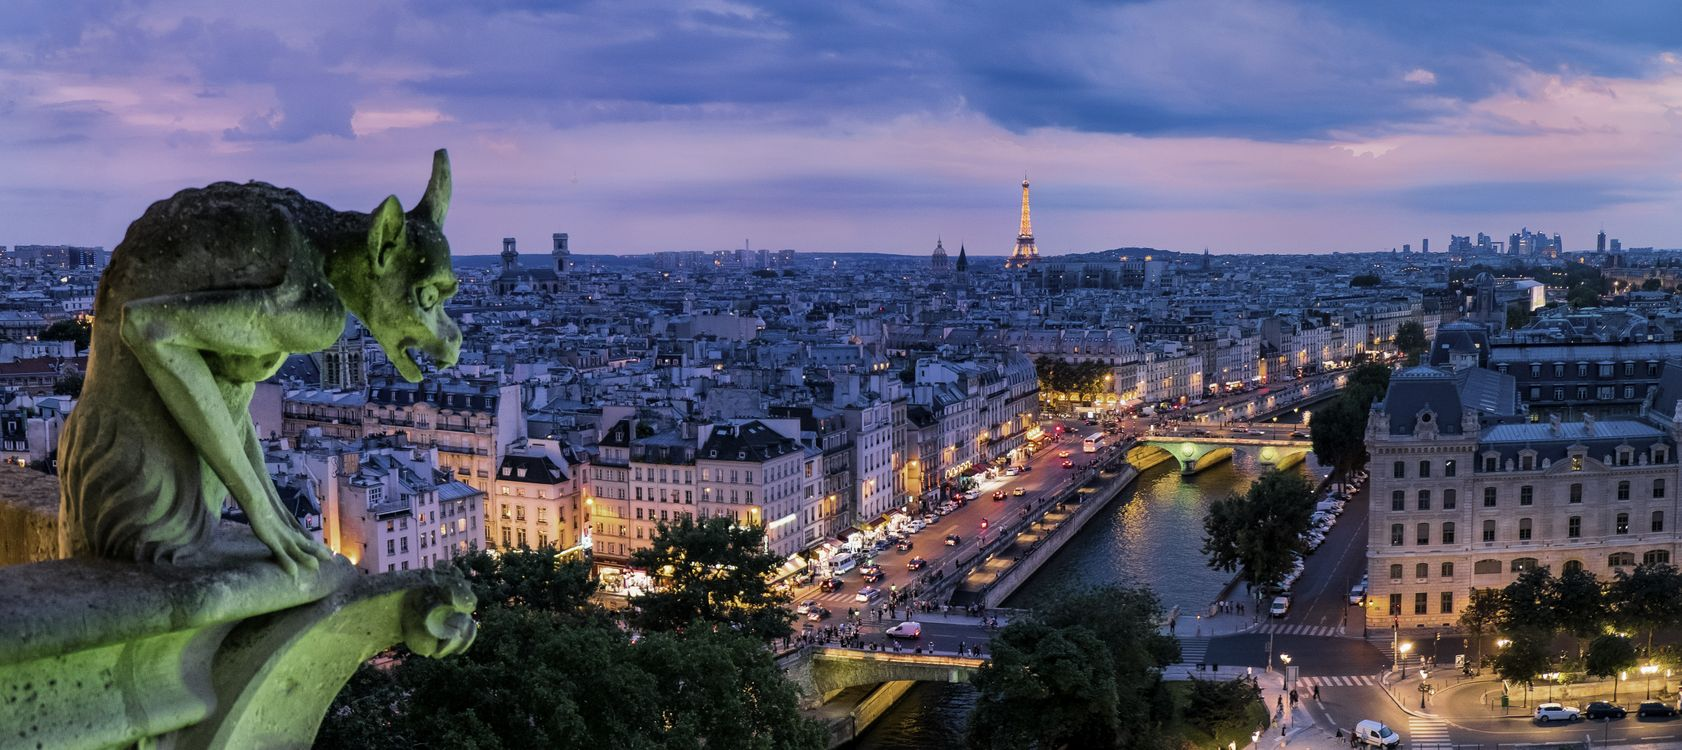 Фото бесплатно Париж, Франция, город, ночь, иллюминация, Эйфелева башня, сумерки, панорама, город